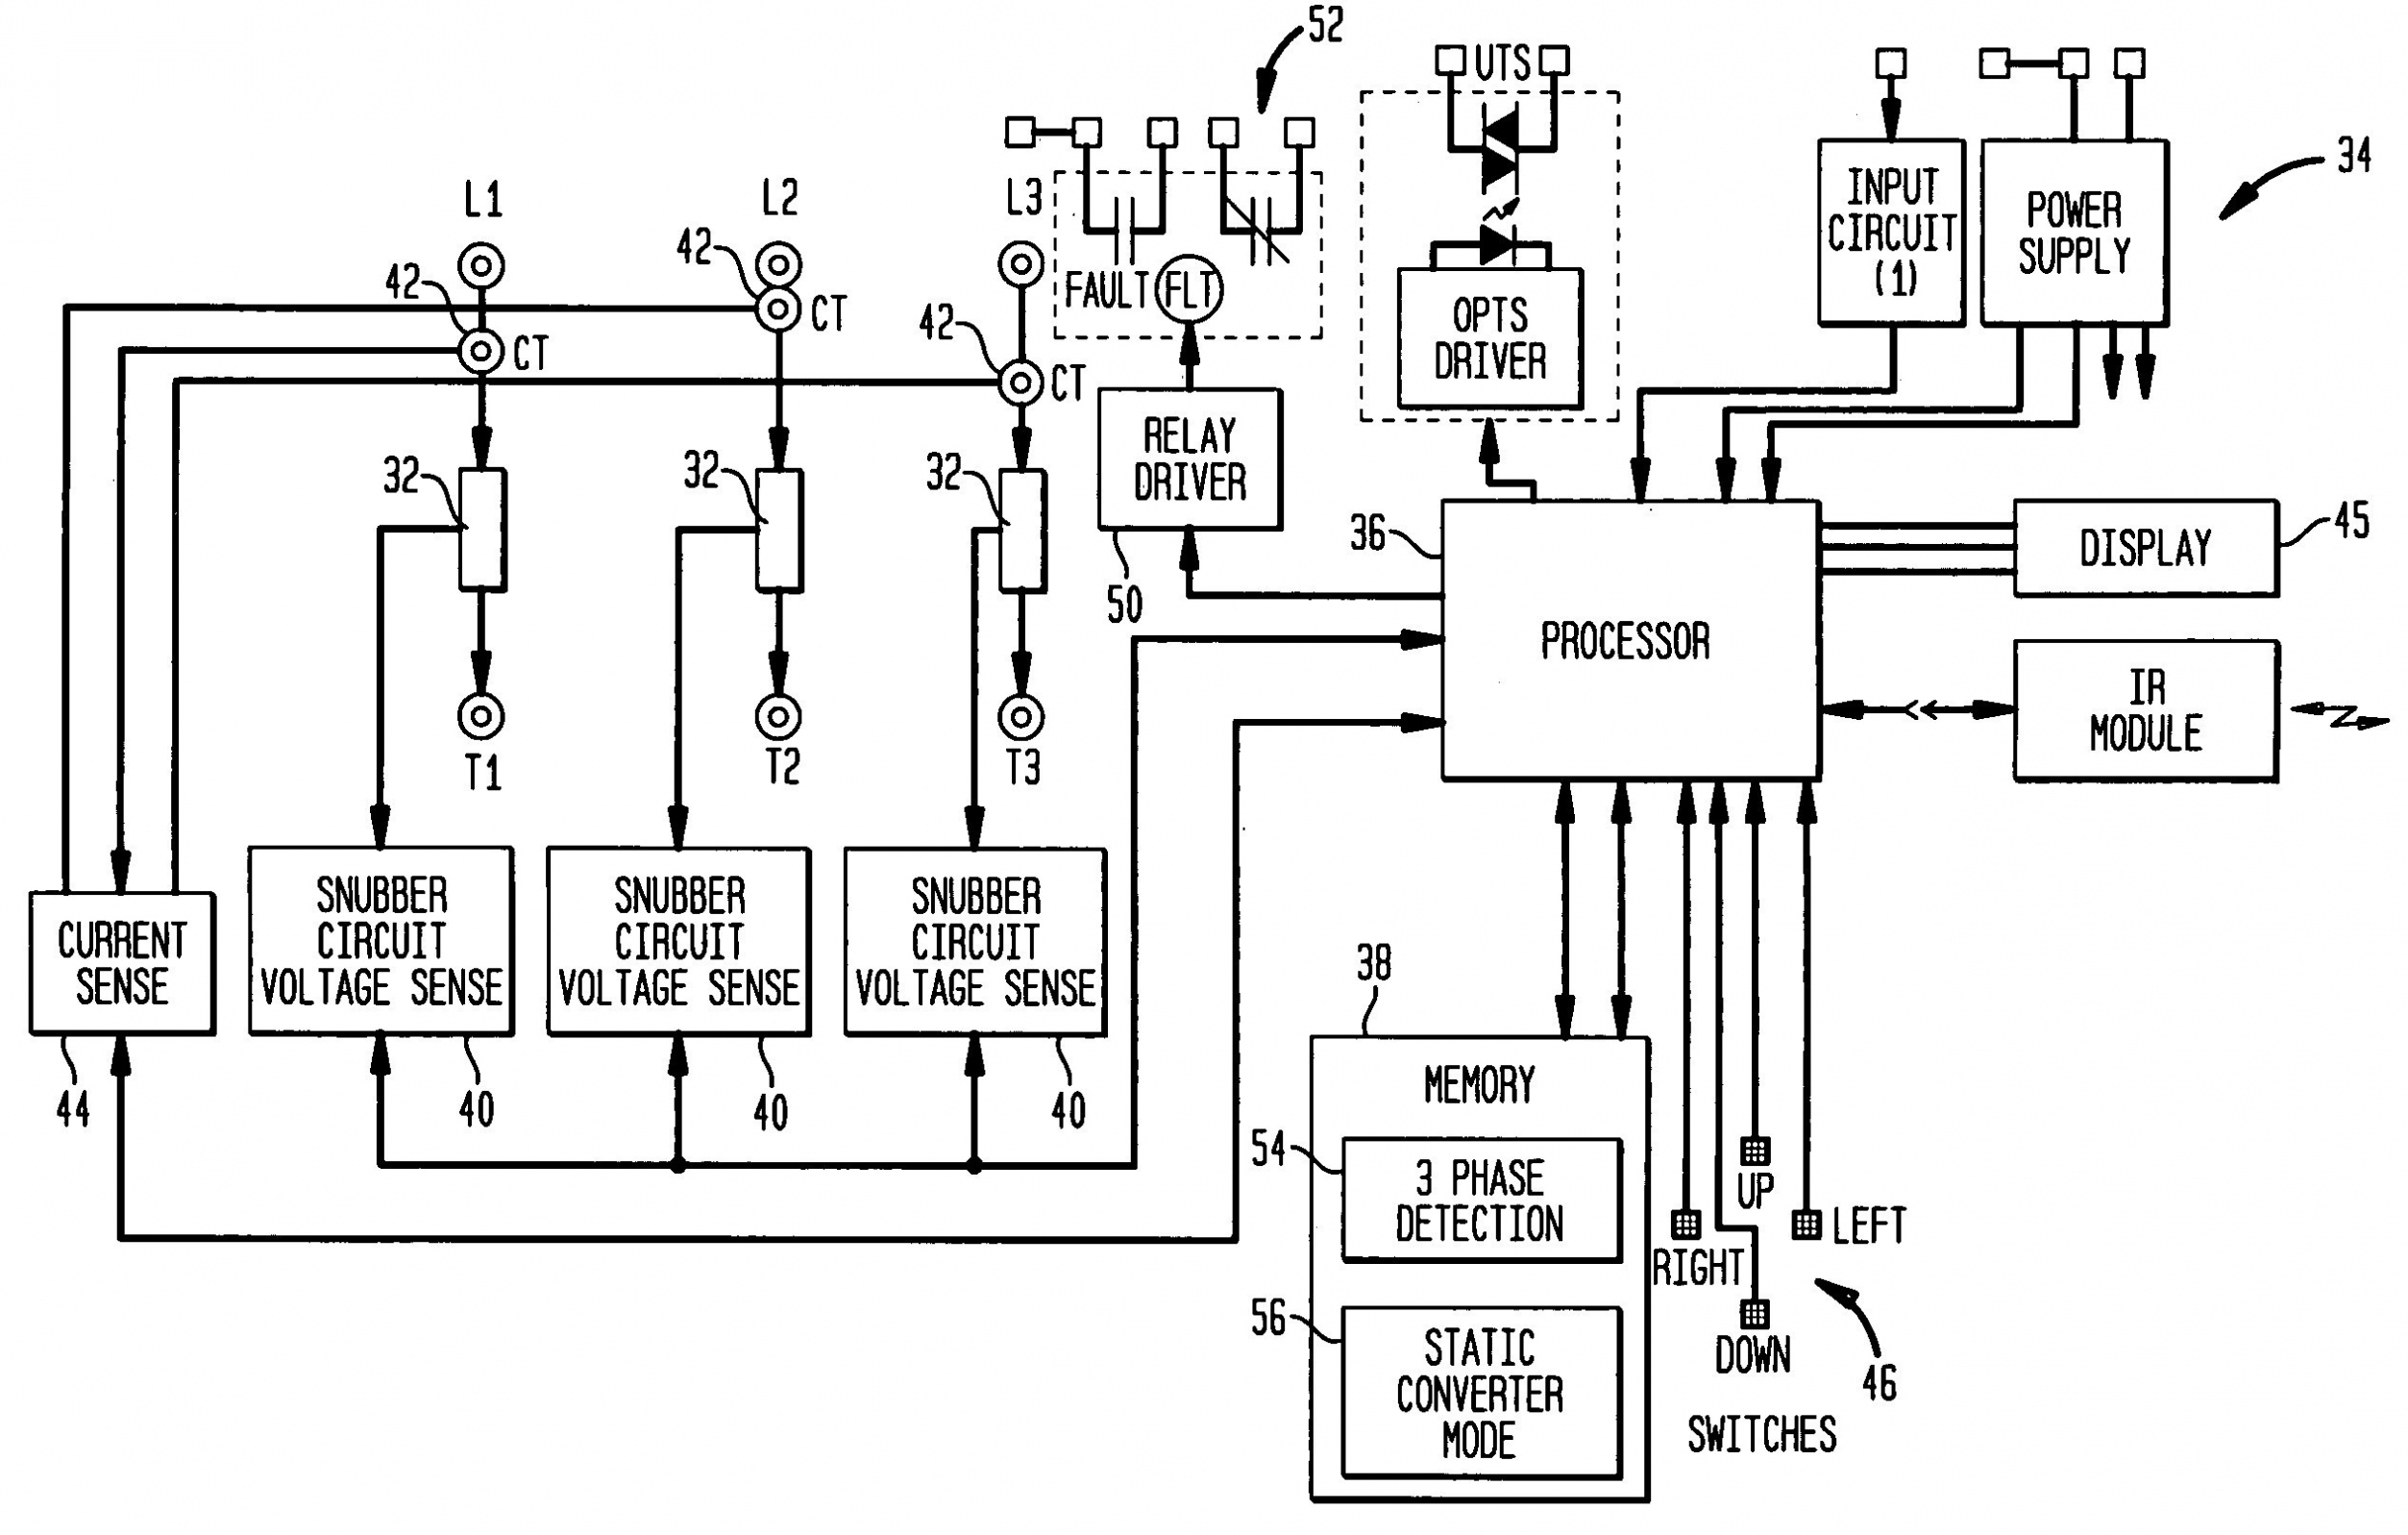 Wiring Diagram Motor 3 Phase Inspirationa Ac Motor Starter Wiring - 3 Phase Motor Starter Wiring Diagram Pdf